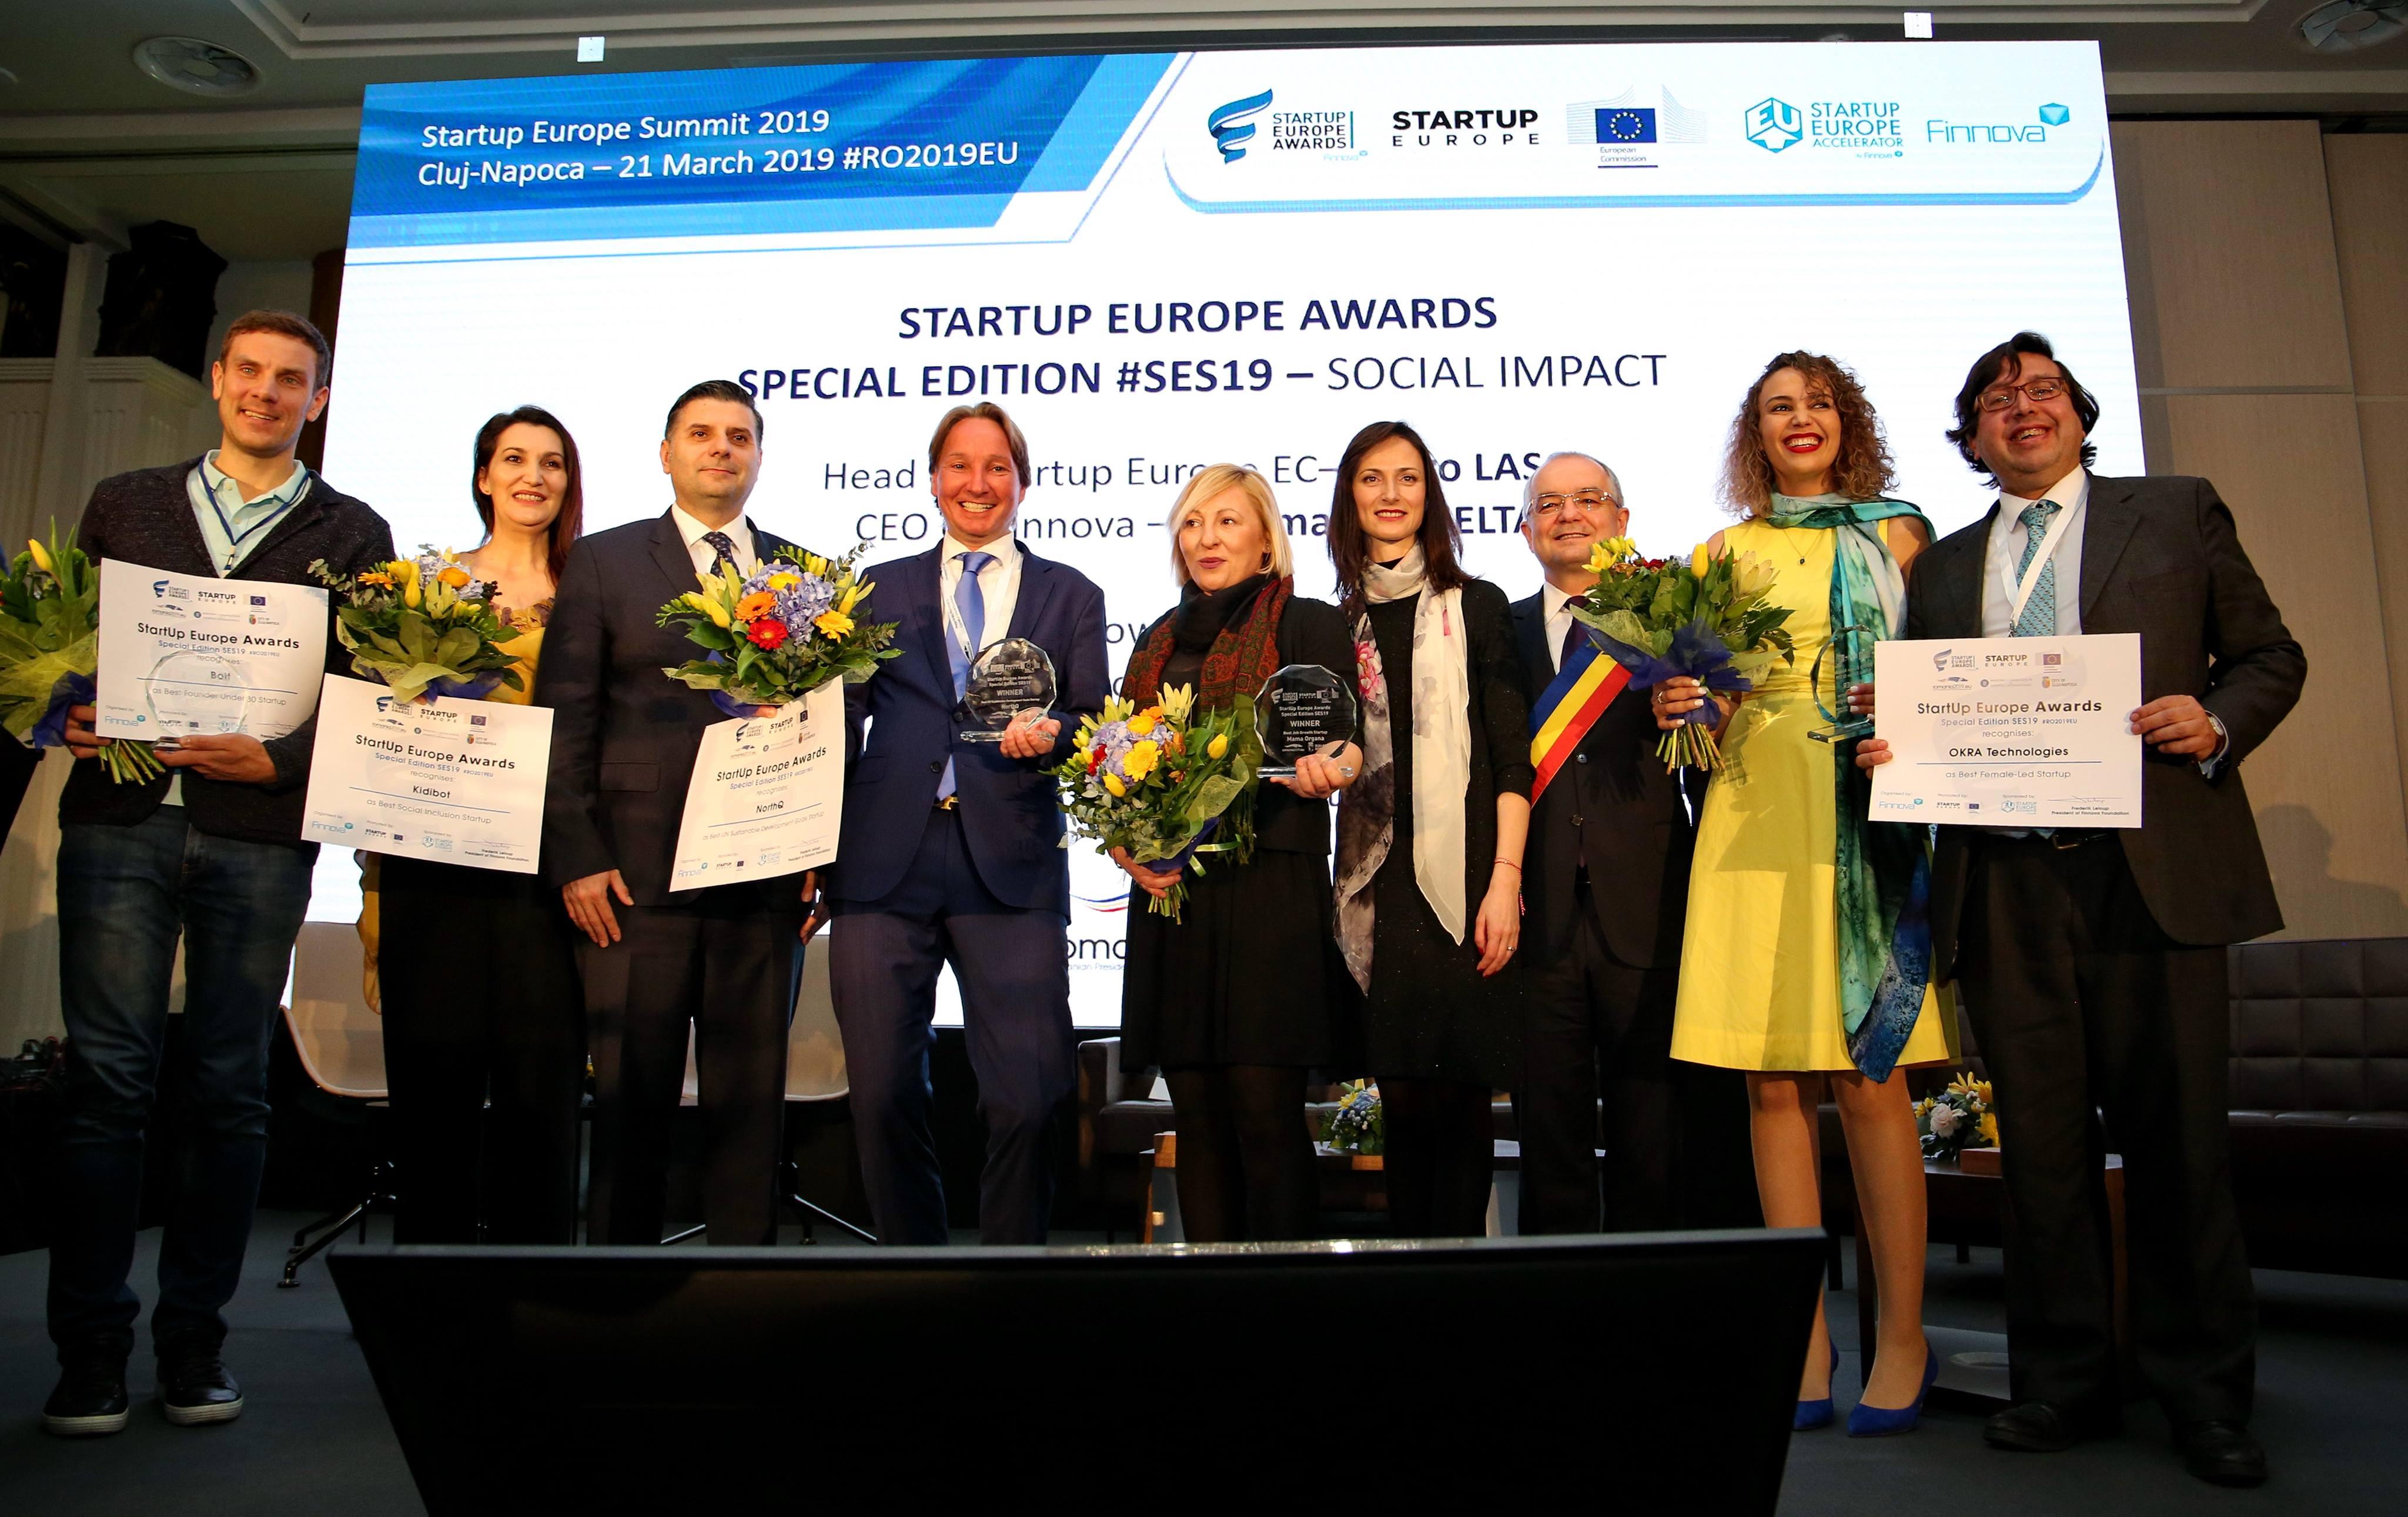 Mariya gabriel, Emil Boc și Alexandru Petrescu, foto de grup cu câștigătorii Startup Europe Awards (foto: Dan Bodea)